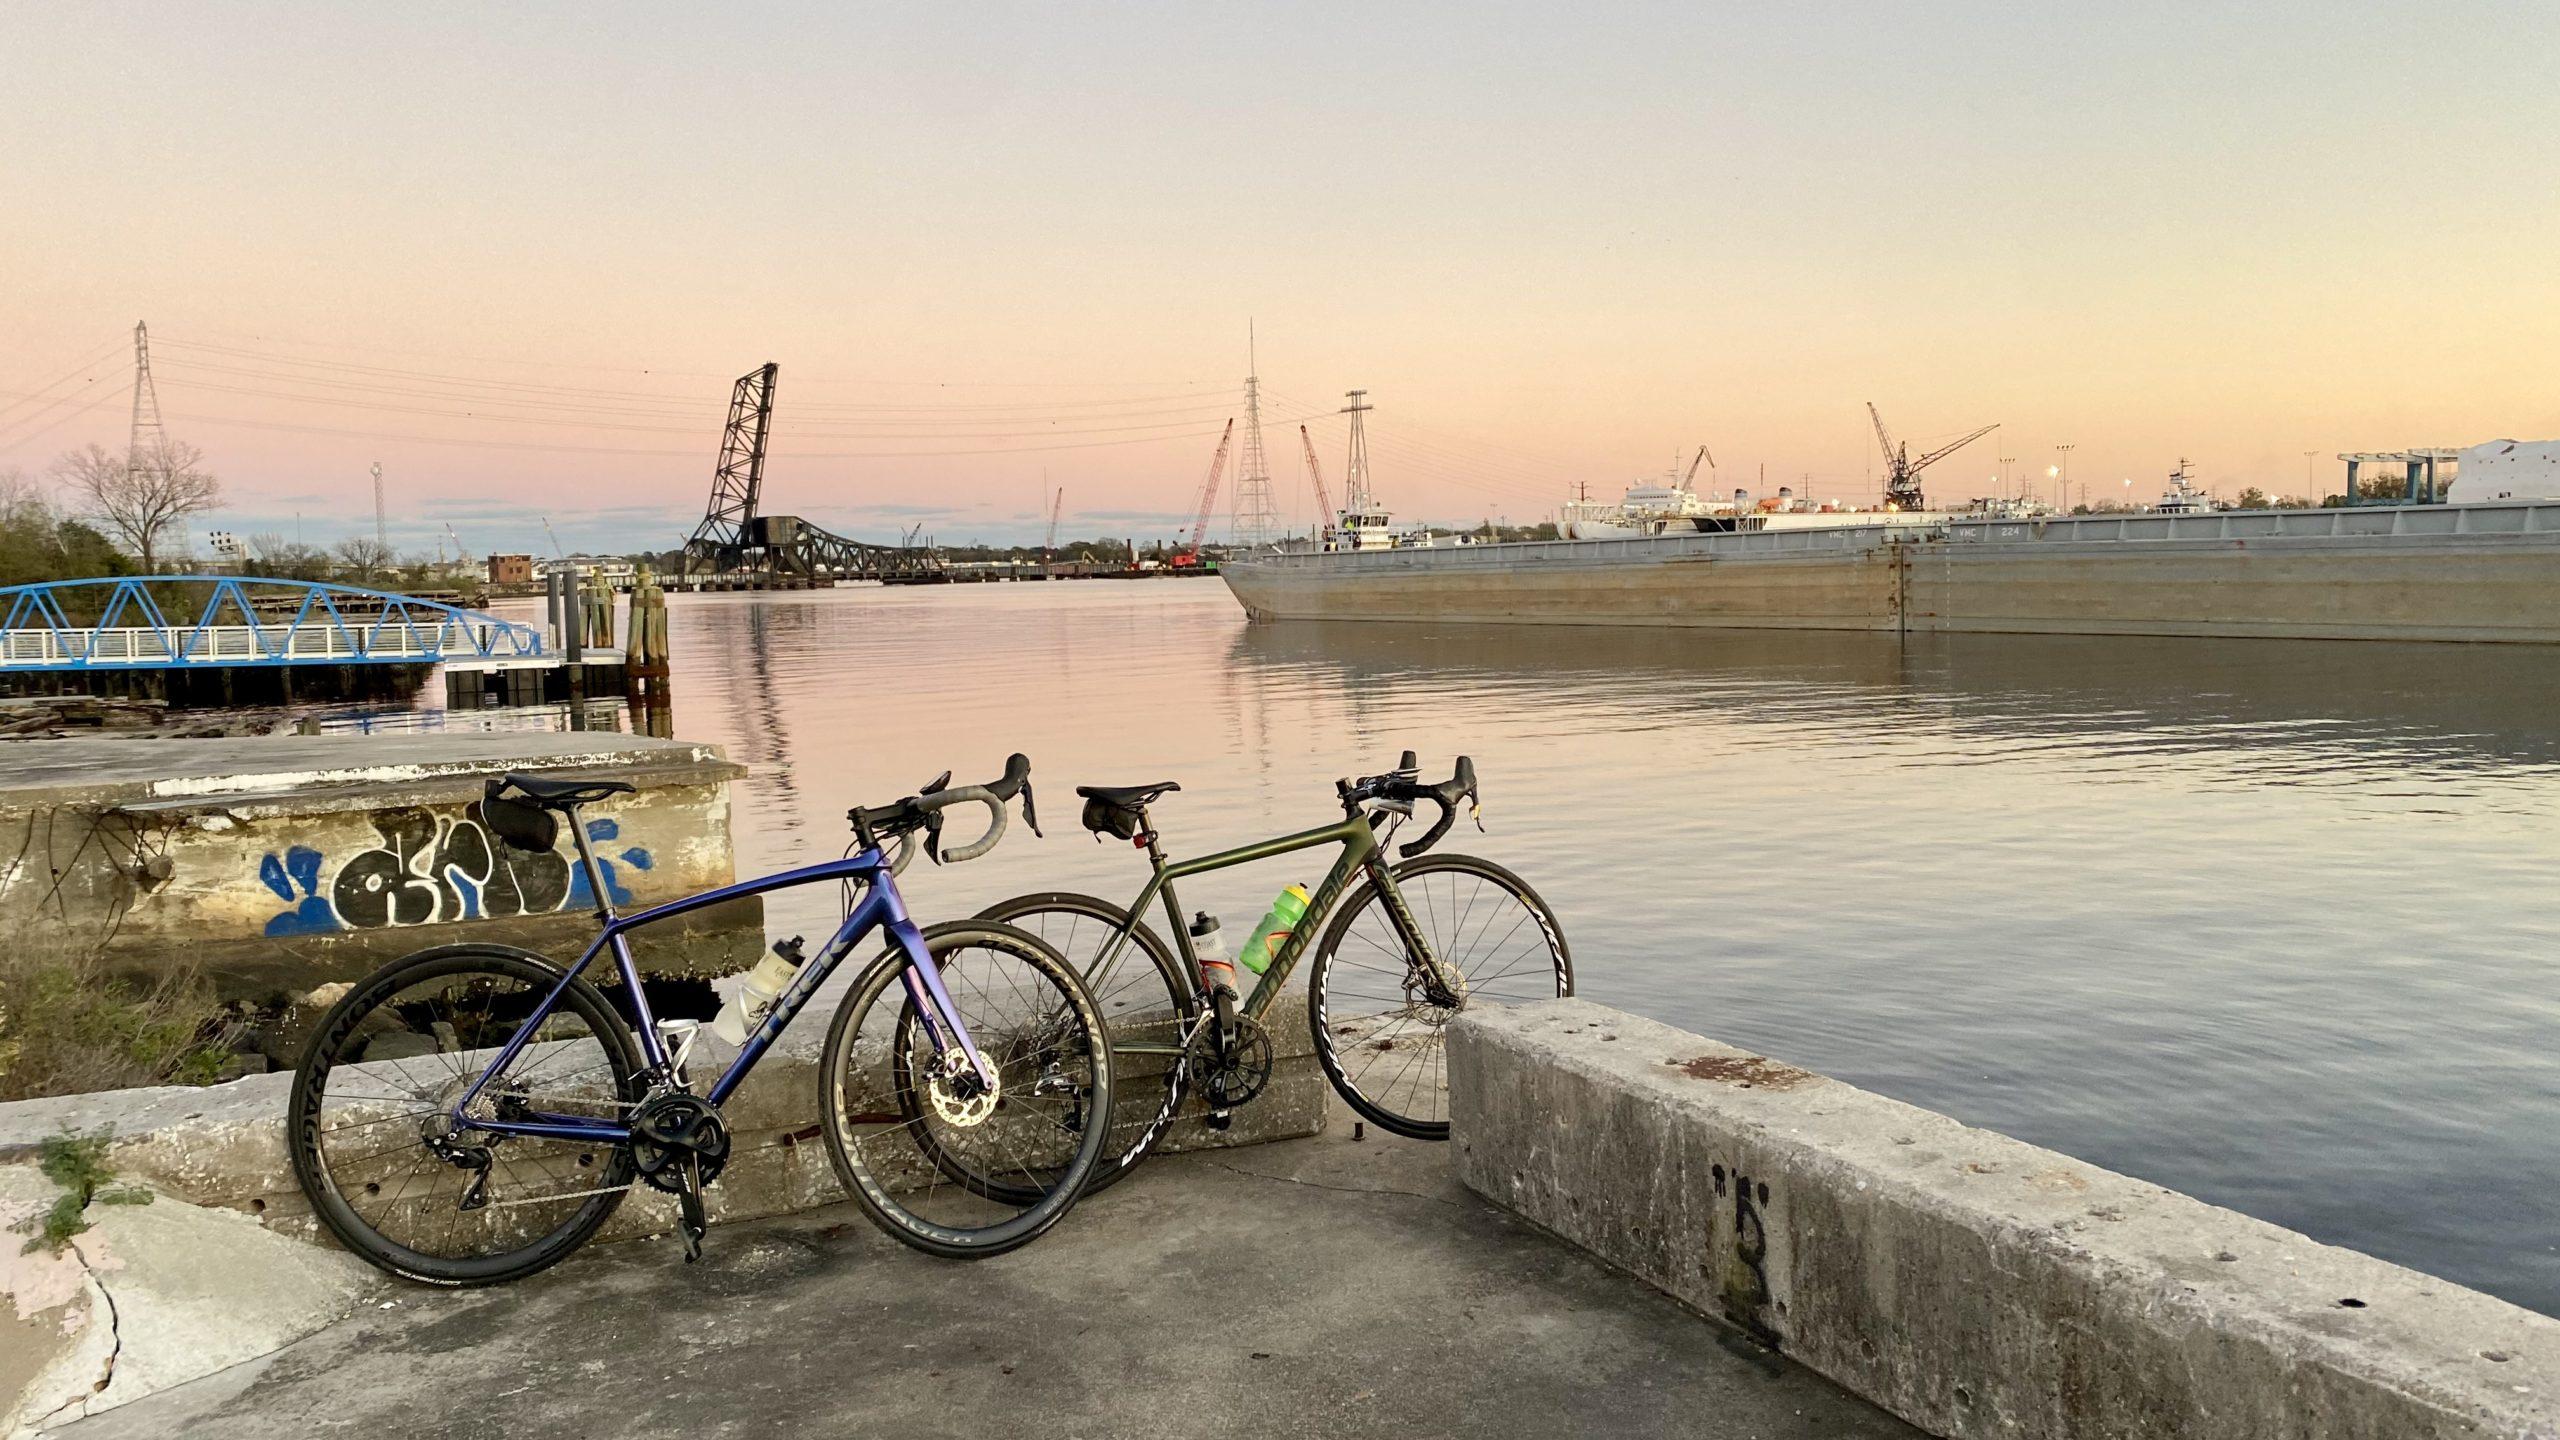 Bikerumor Bild des Tages: Elizabeth River – Norfolk, Virginia